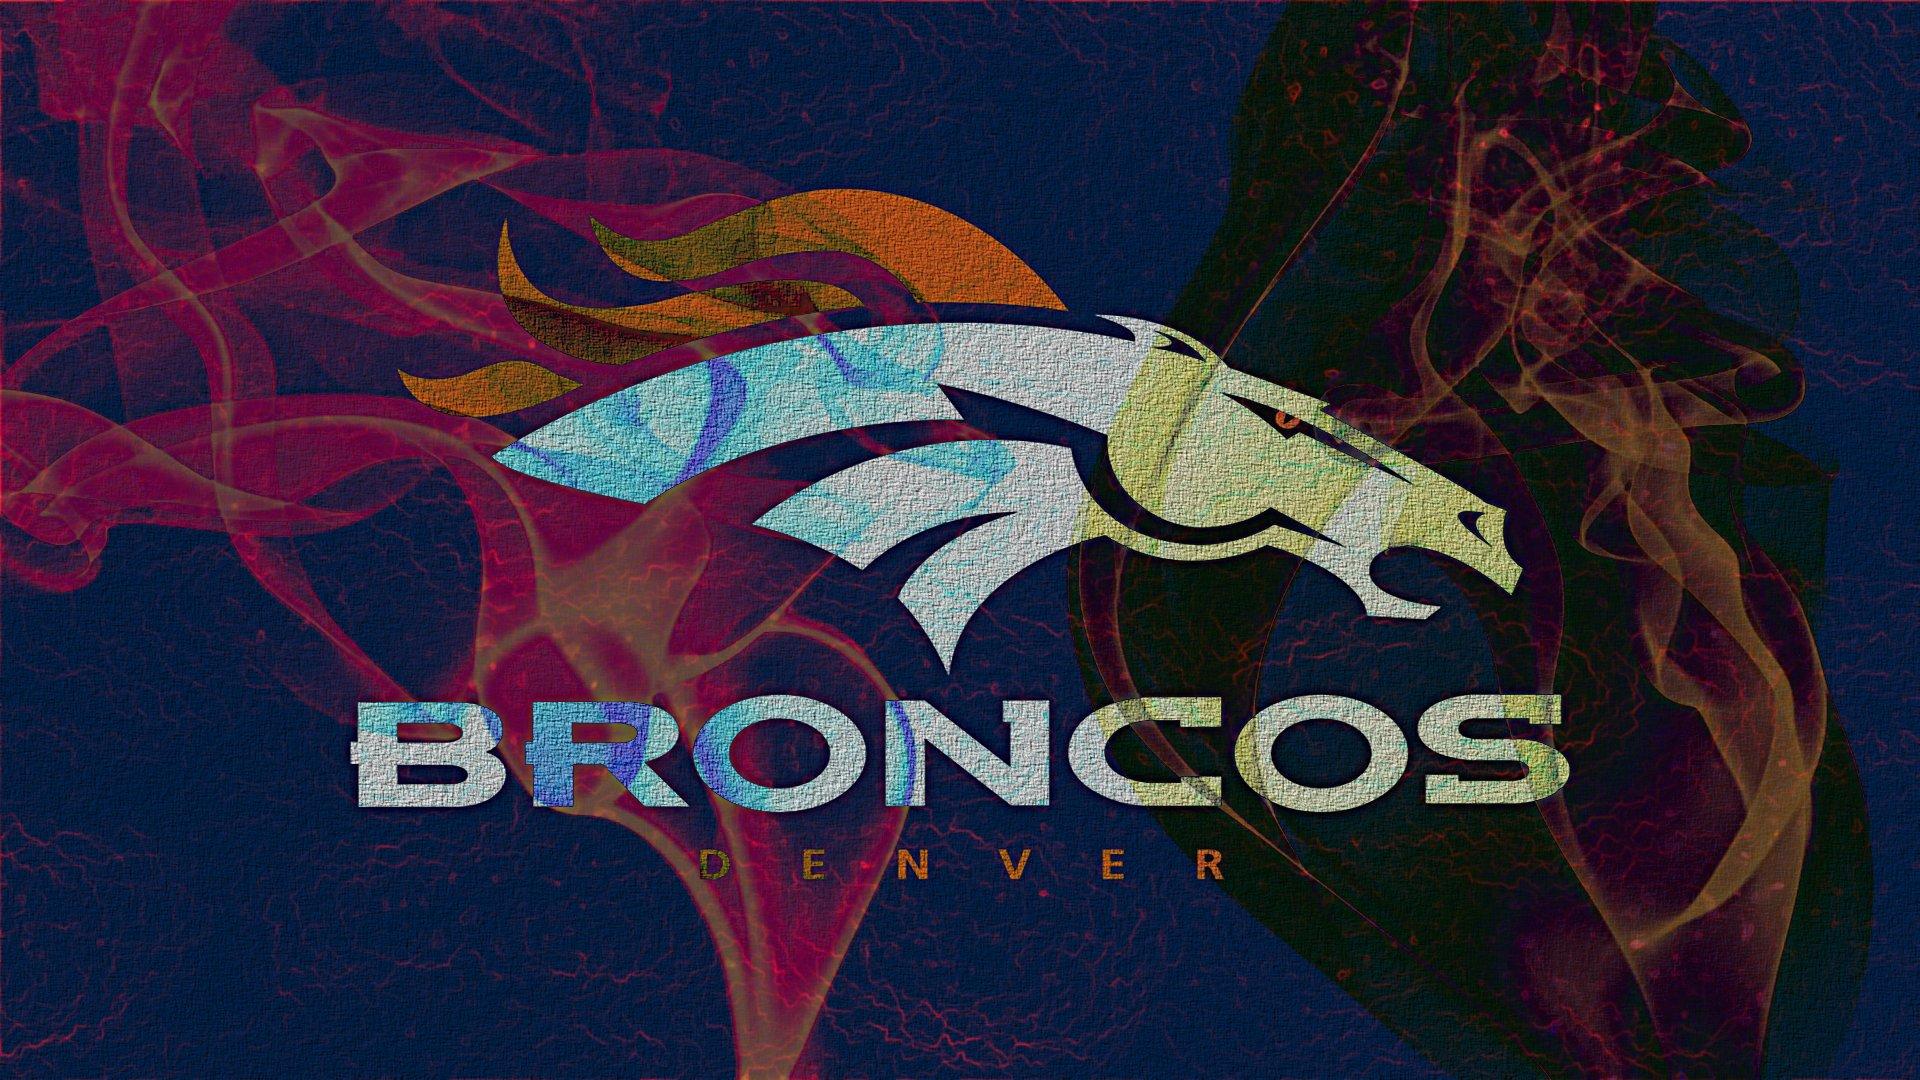 Wallpapers Denver Broncos Logo 1920 X 1200 230 Kb Jpeg HD Wallpapers 1920x1080